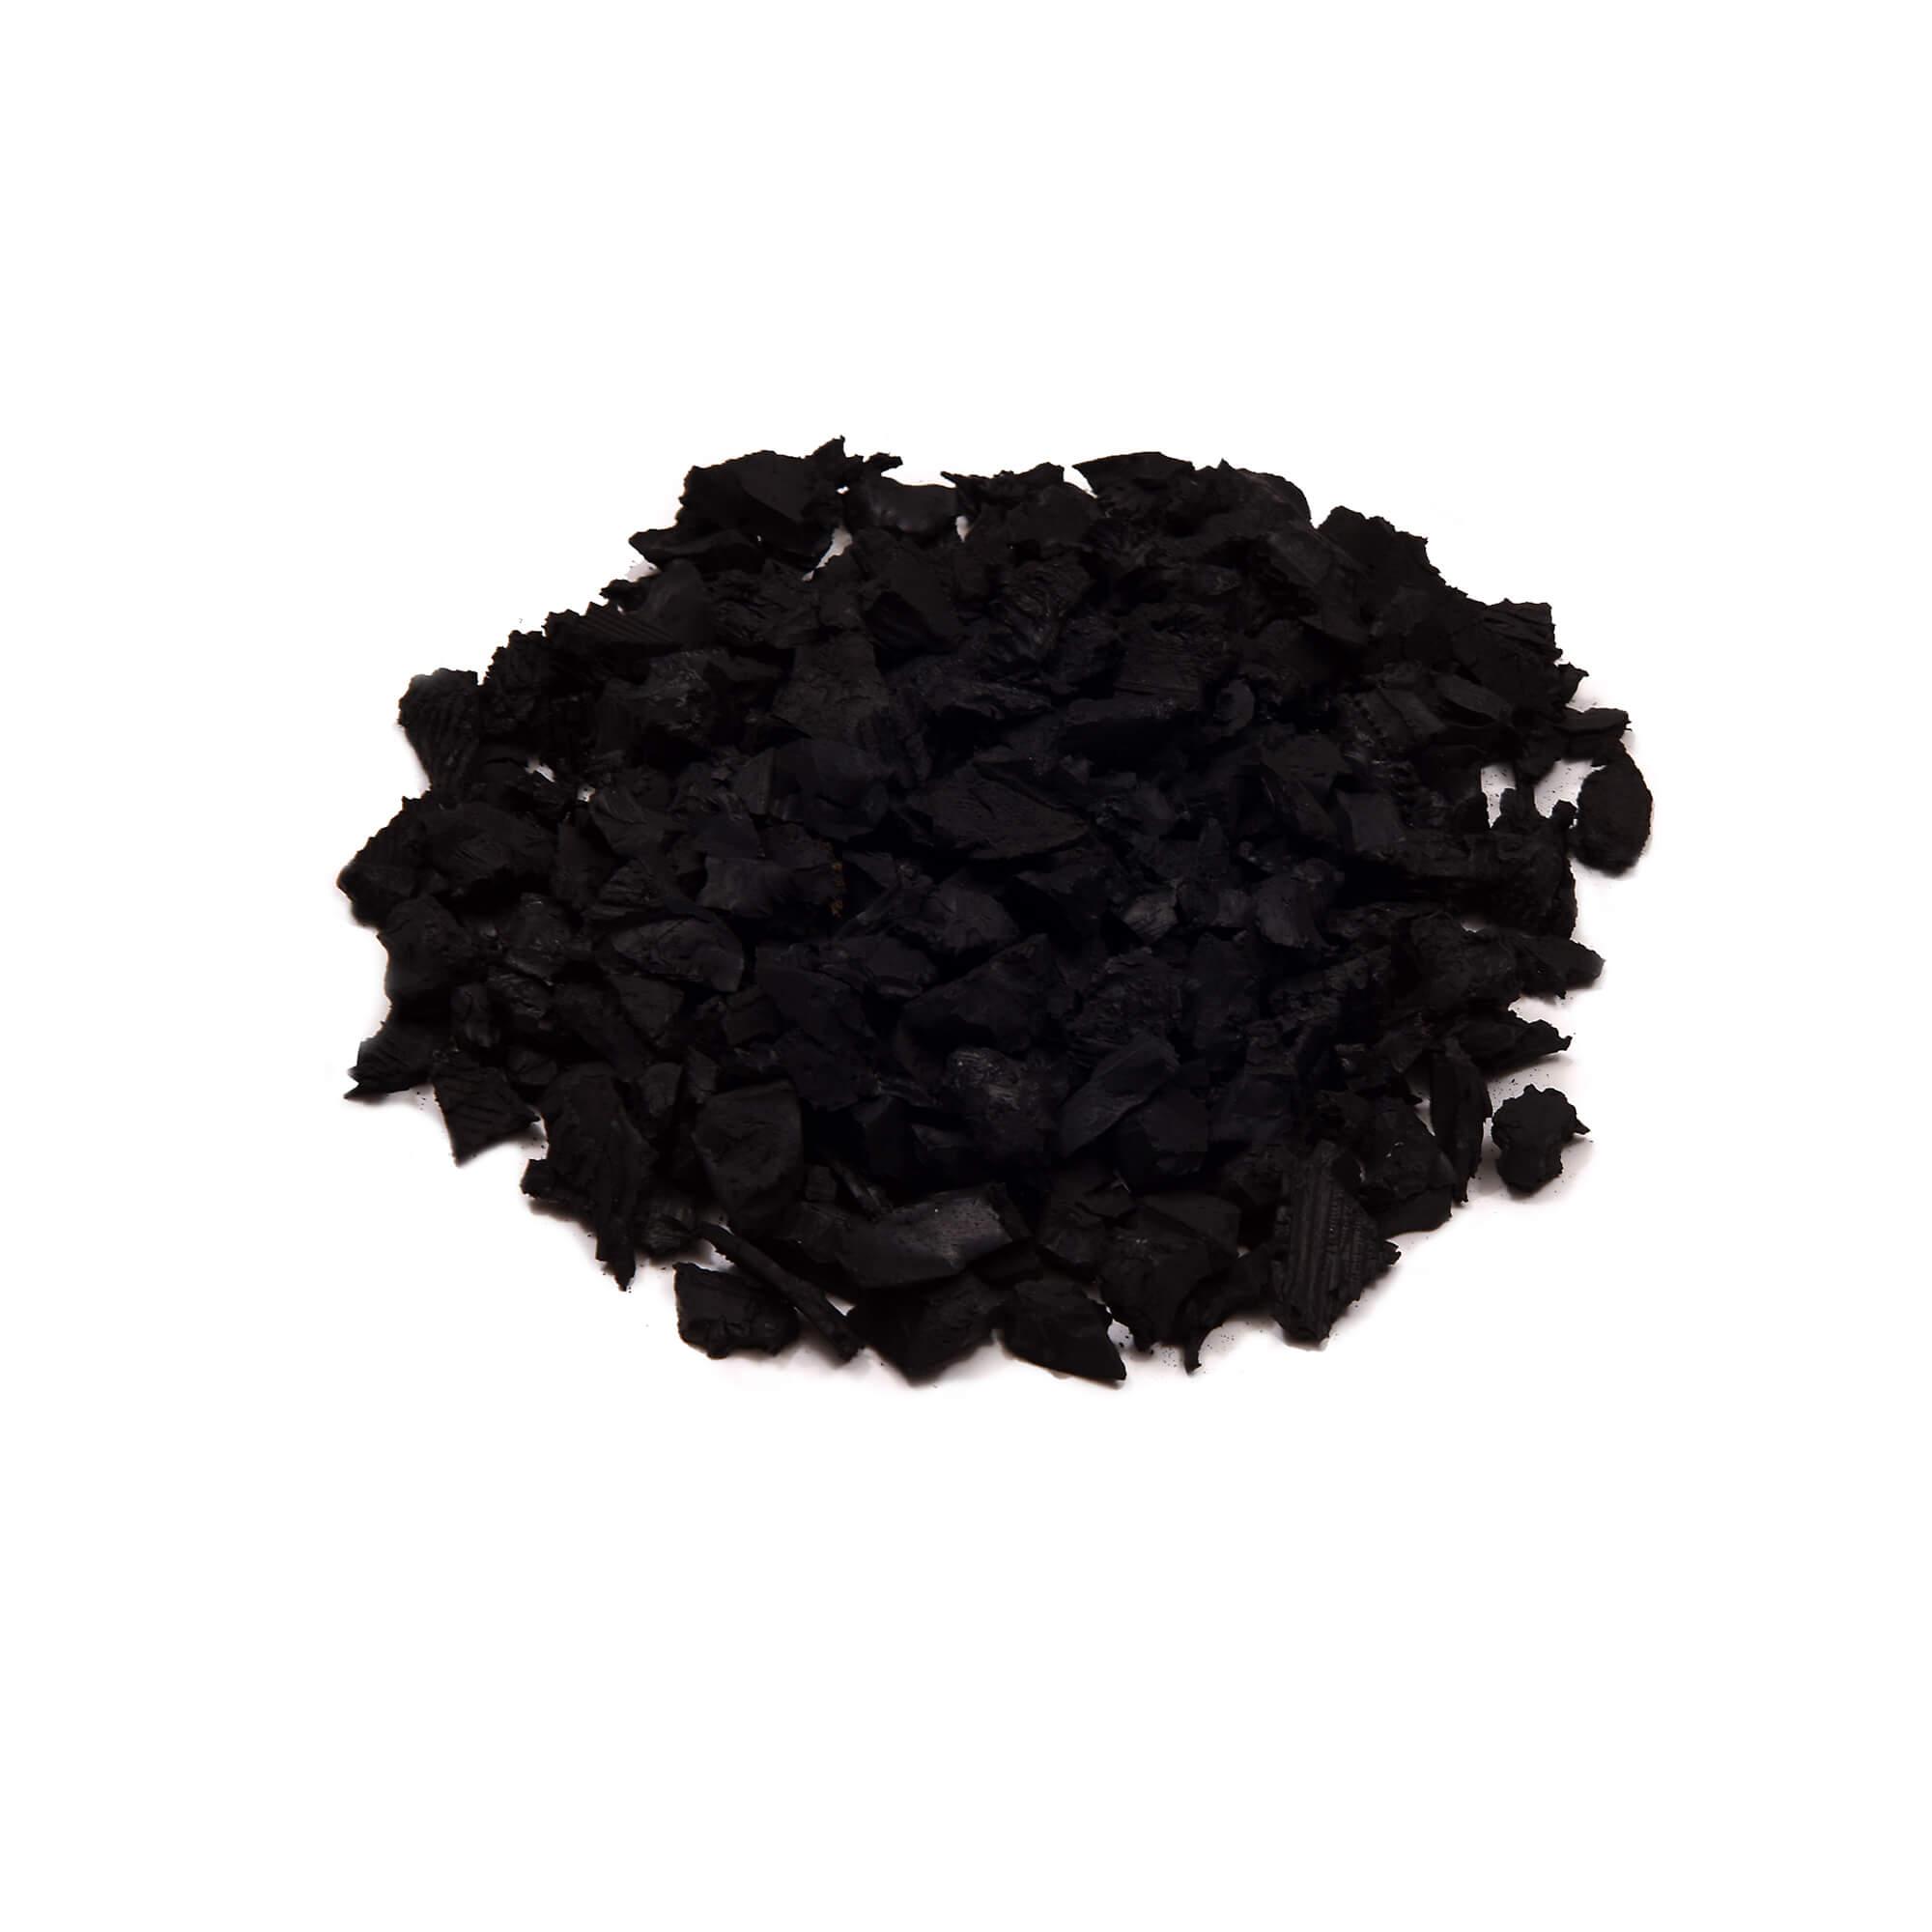 unpainted rubber mulch